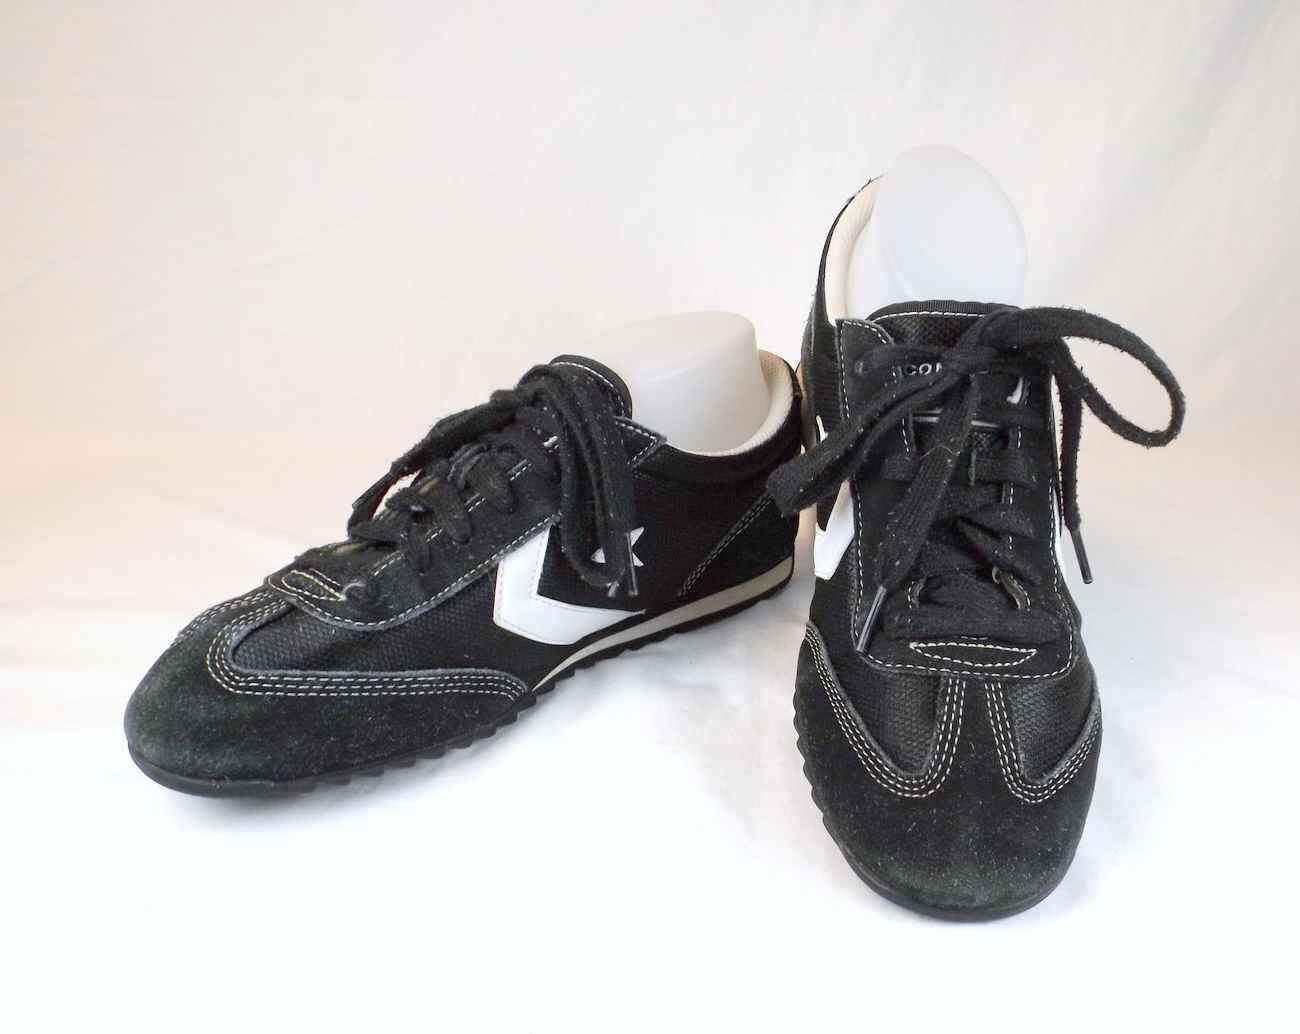 4330edfbd80 Converse Road Star Athletic Shoes US Mens 8.5 Womens 10 UK 7.5 ...